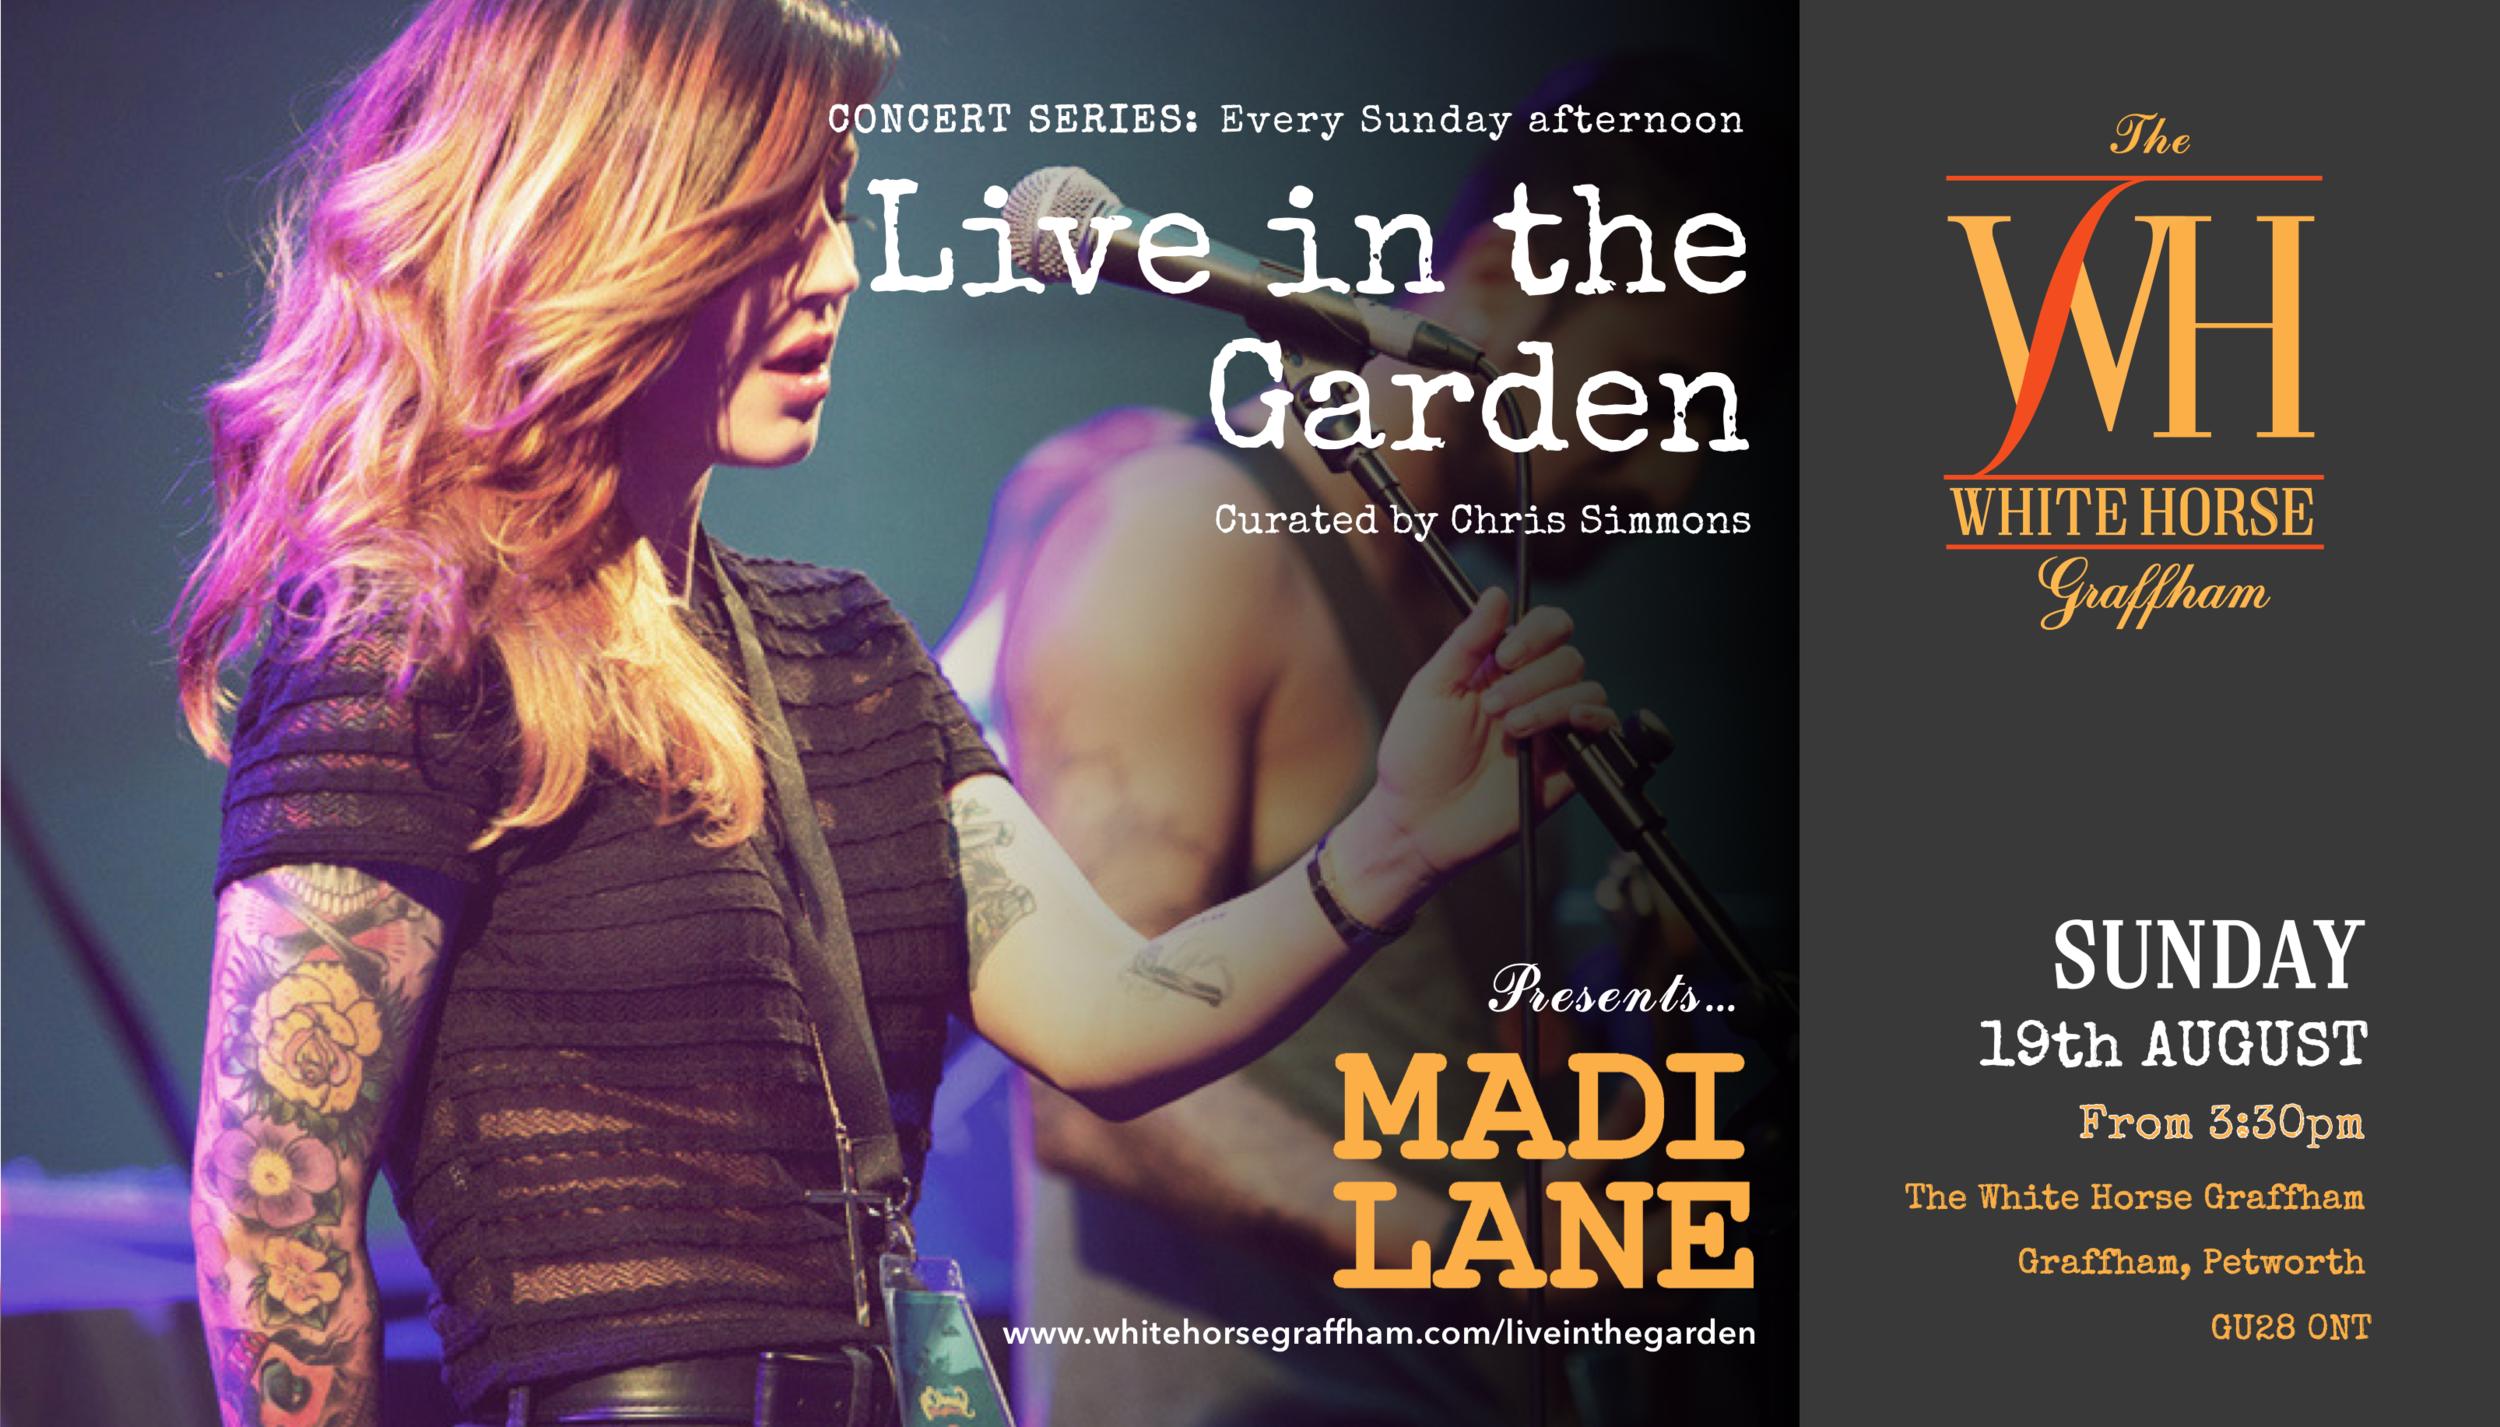 Madi Lane Live music White Horse Graffham